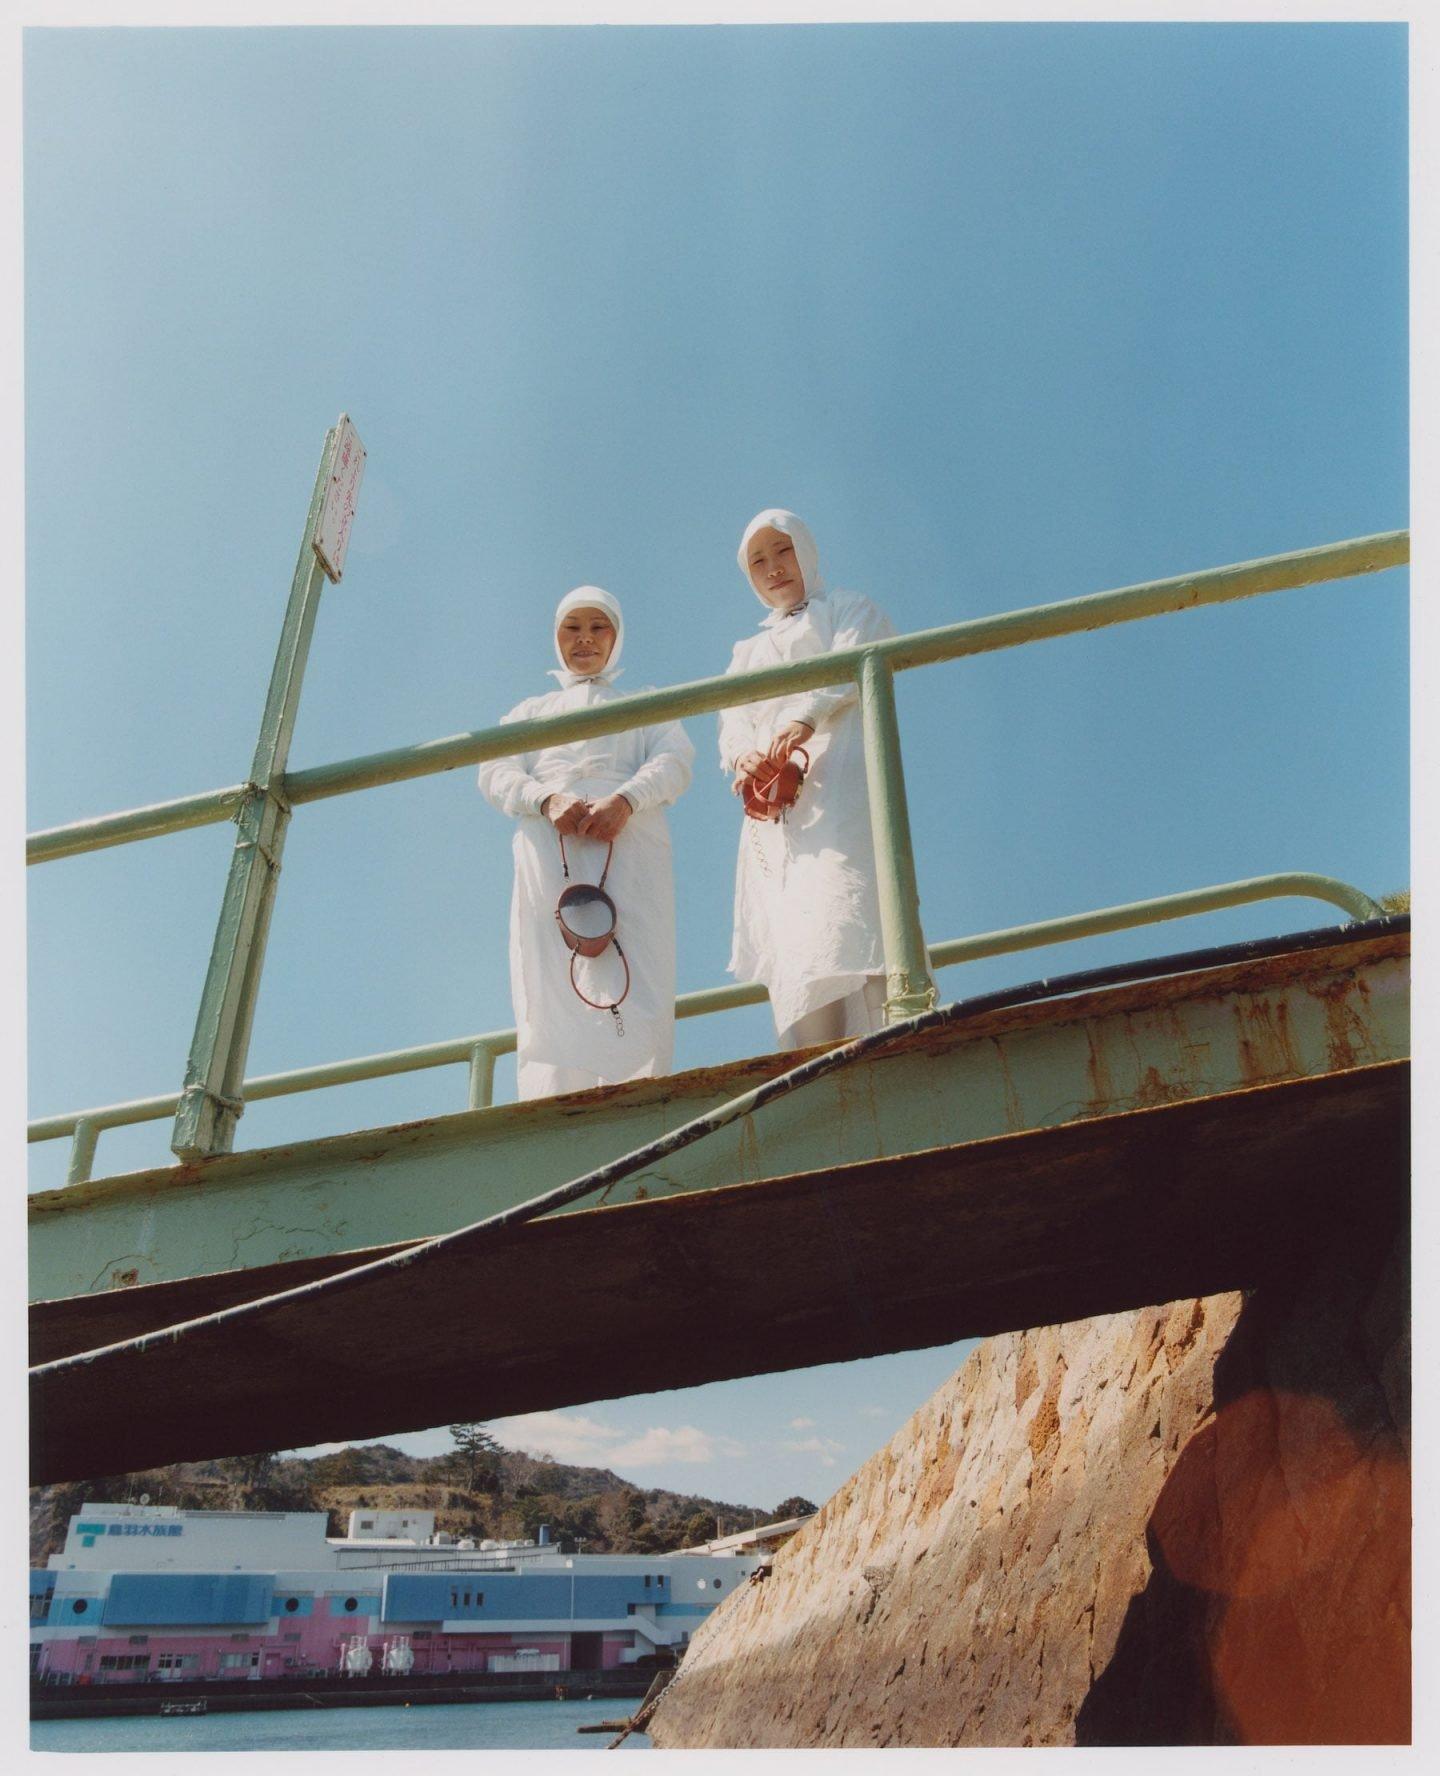 IGNANT-Photography-Stefan-Dotter-Sea-Women-Japan-09